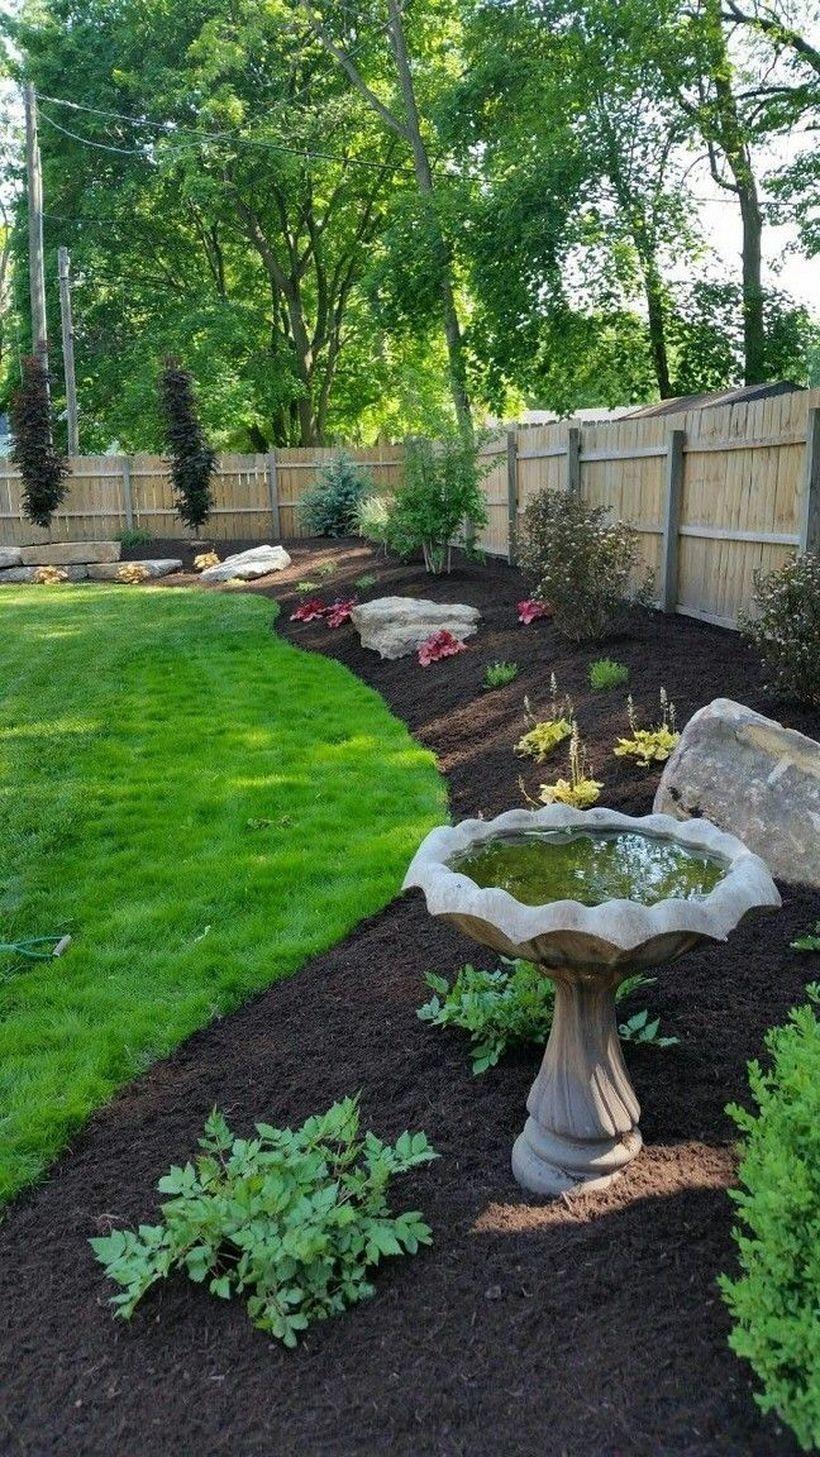 45 Top Trend Backyard Landscape Decoration Ideas You Must Have - decoarchi.com